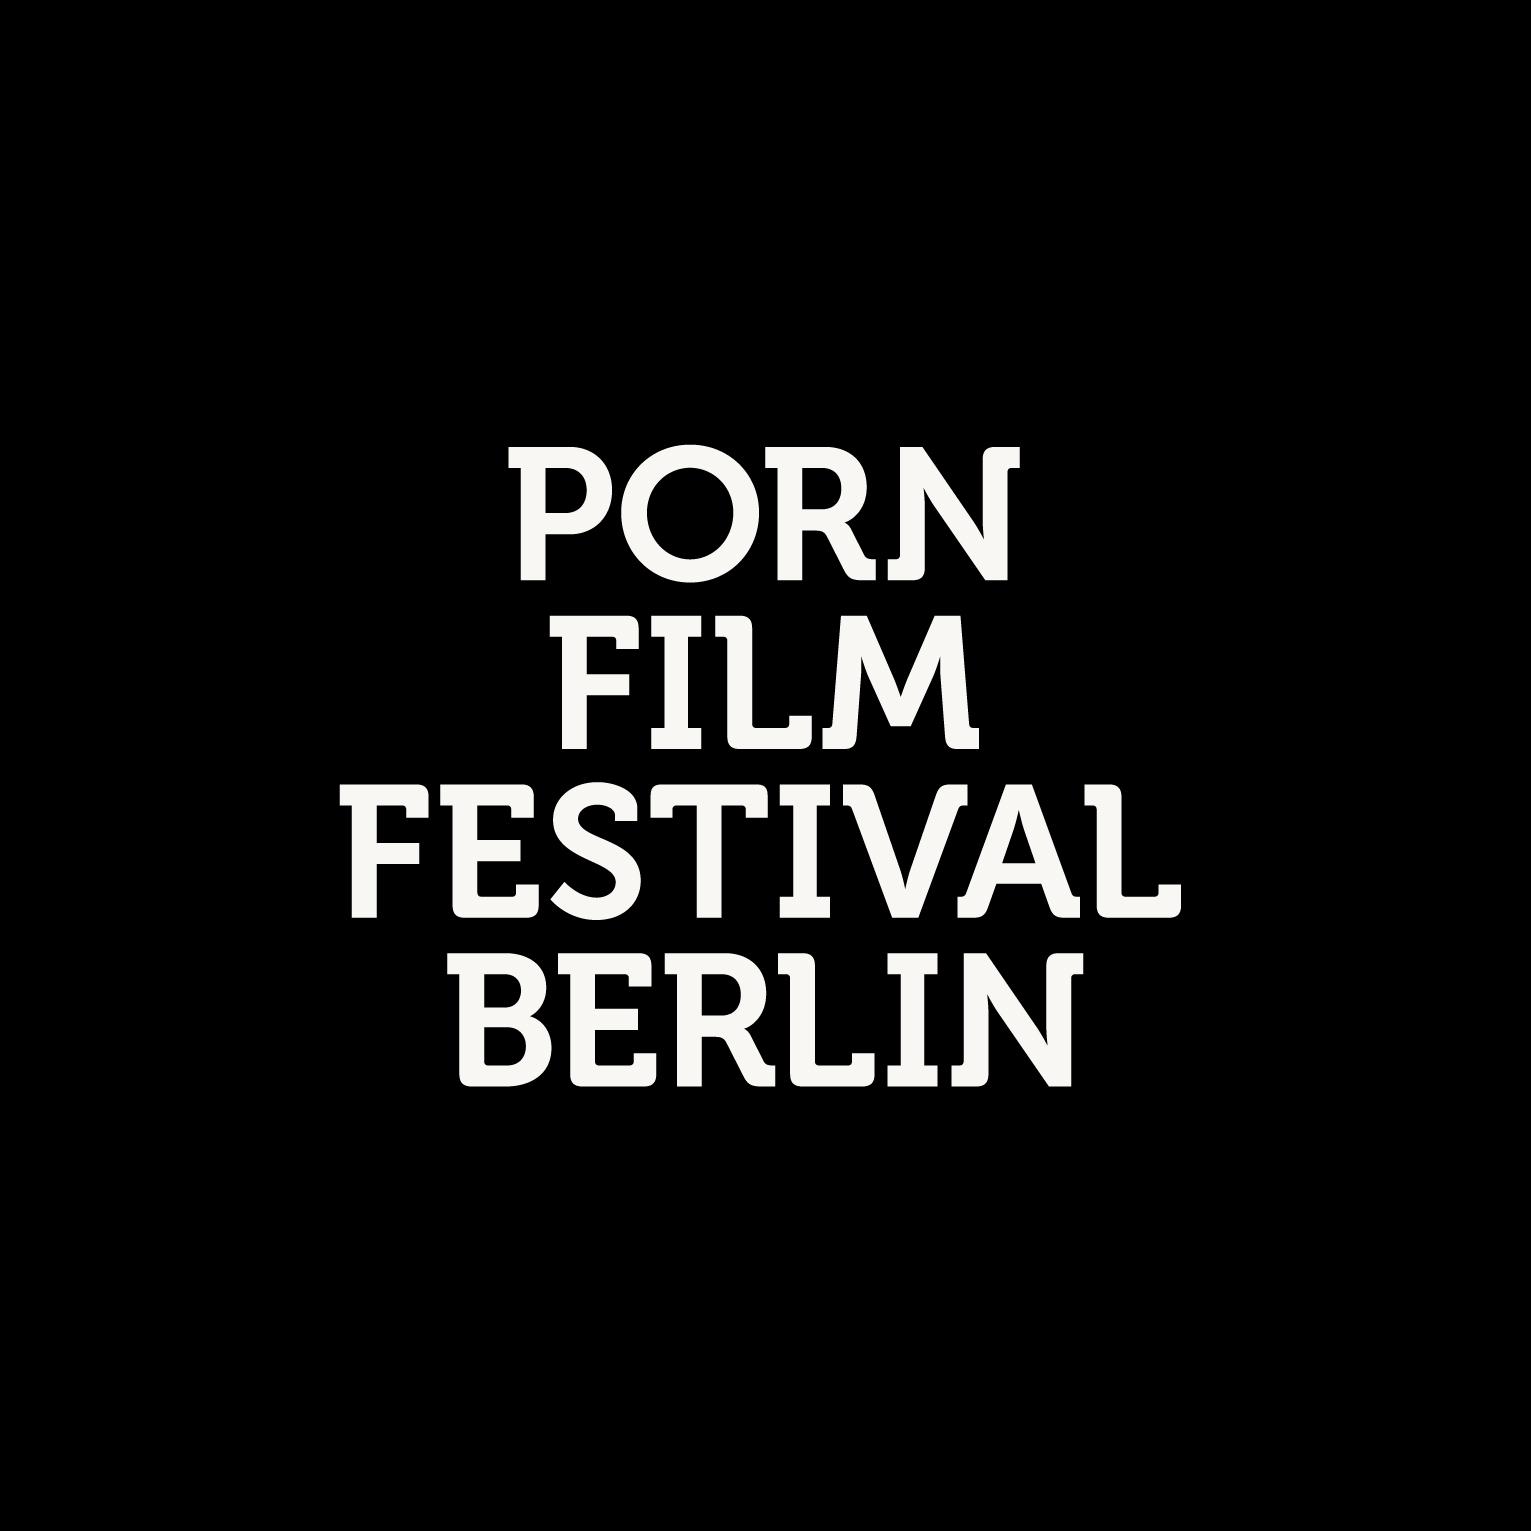 Porn Film Festival Berlin photo